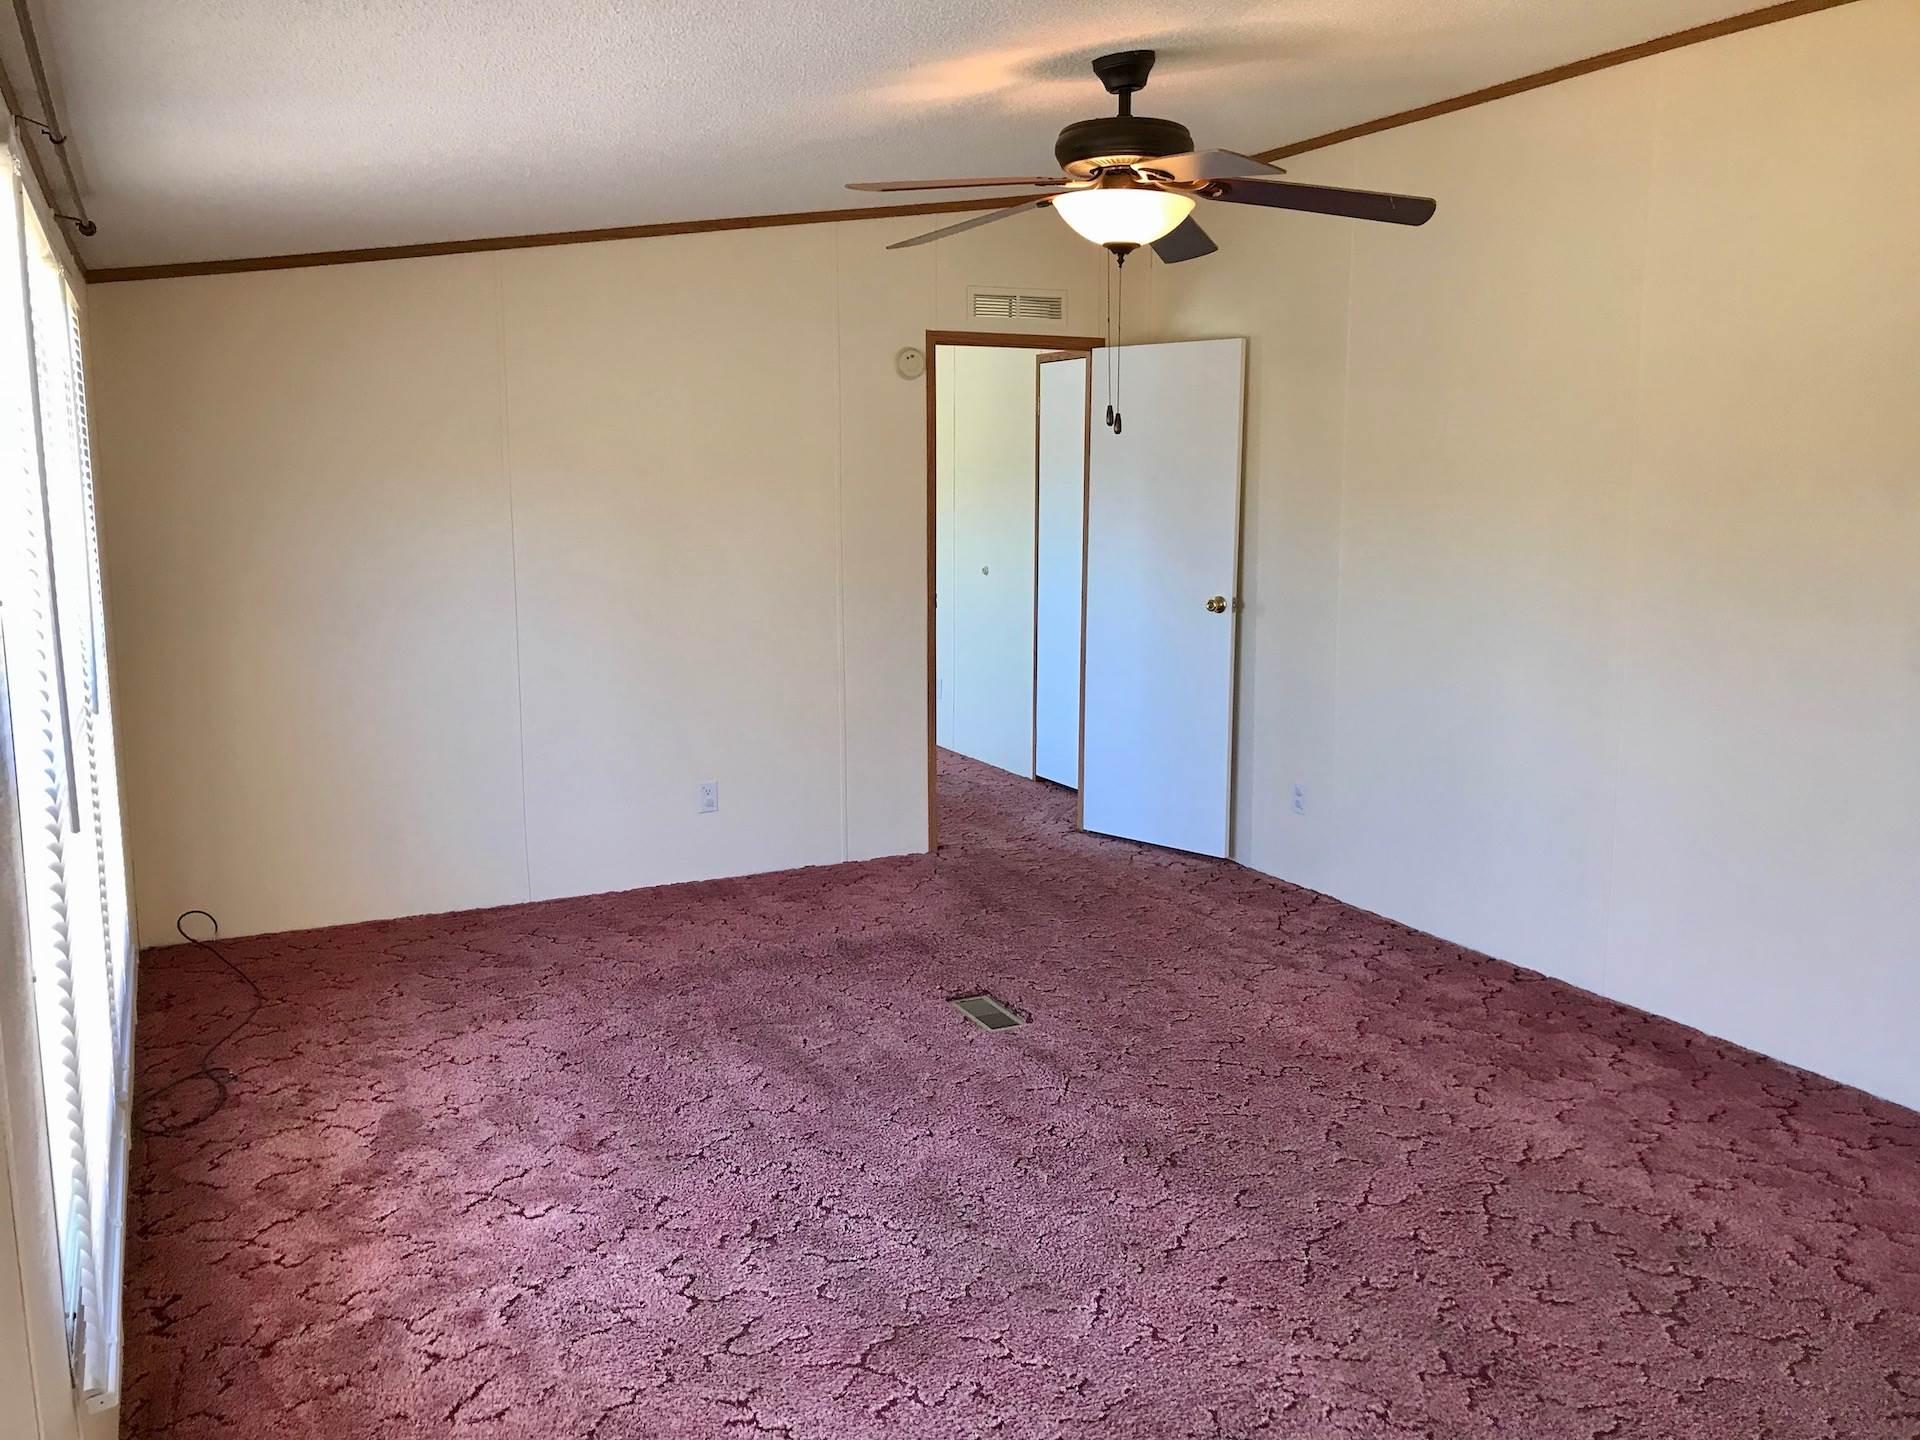 119 Pine Glade Road, Rural Retreat, VA 24368